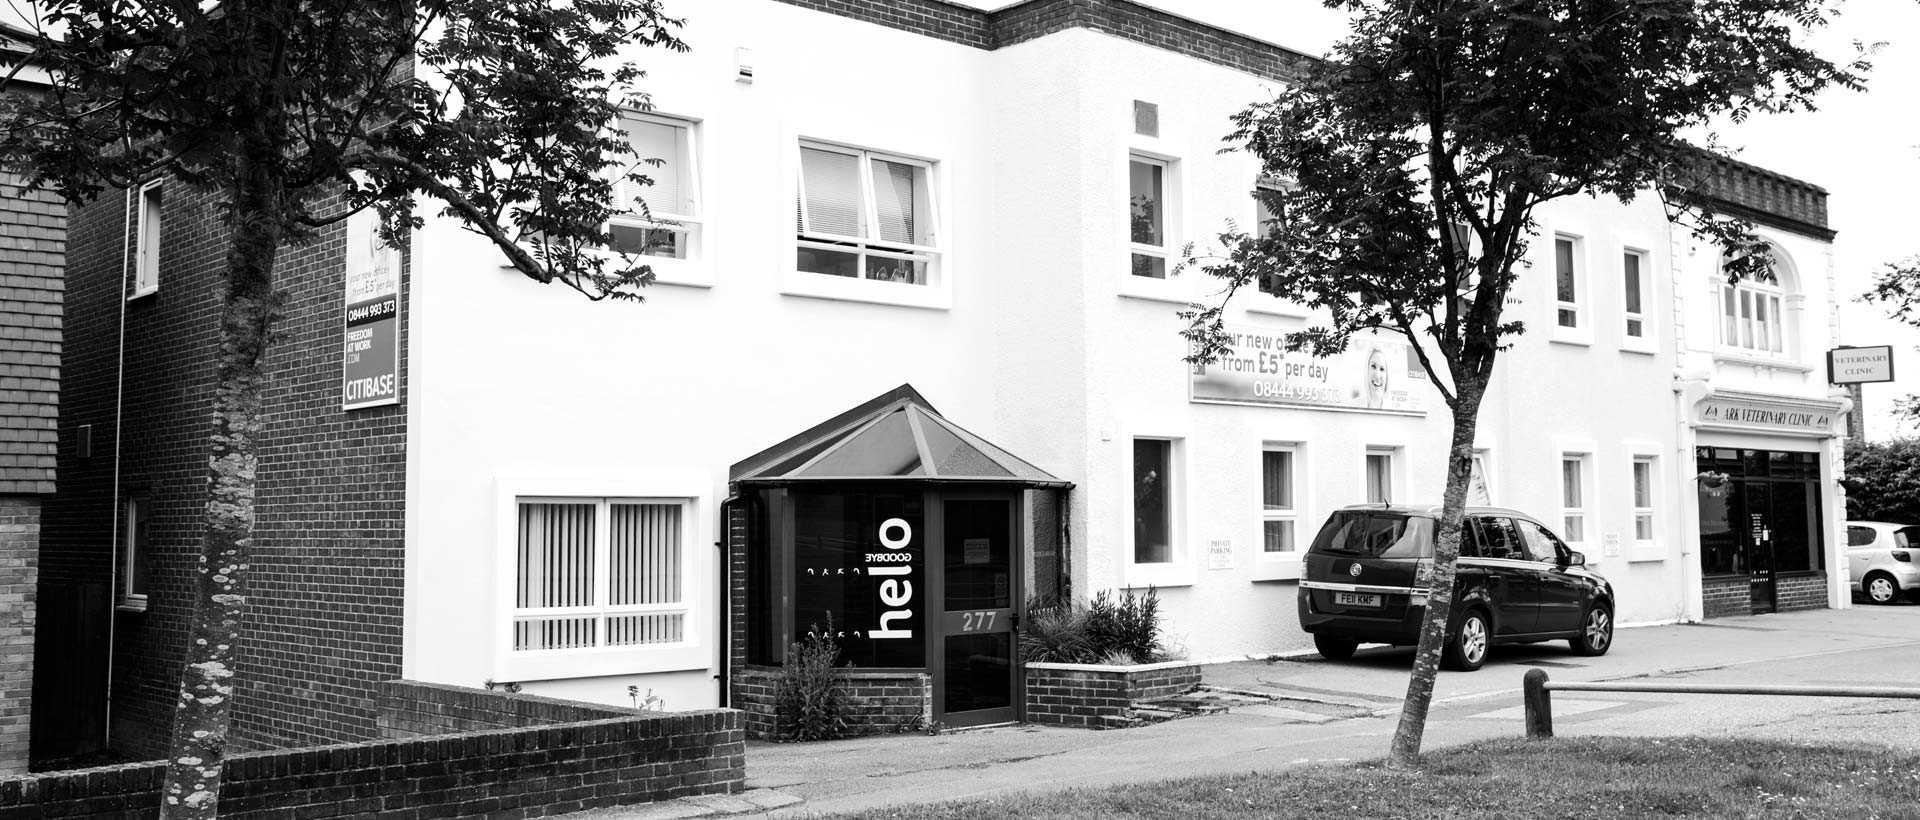 London Road, Burgess Hill, Image 1